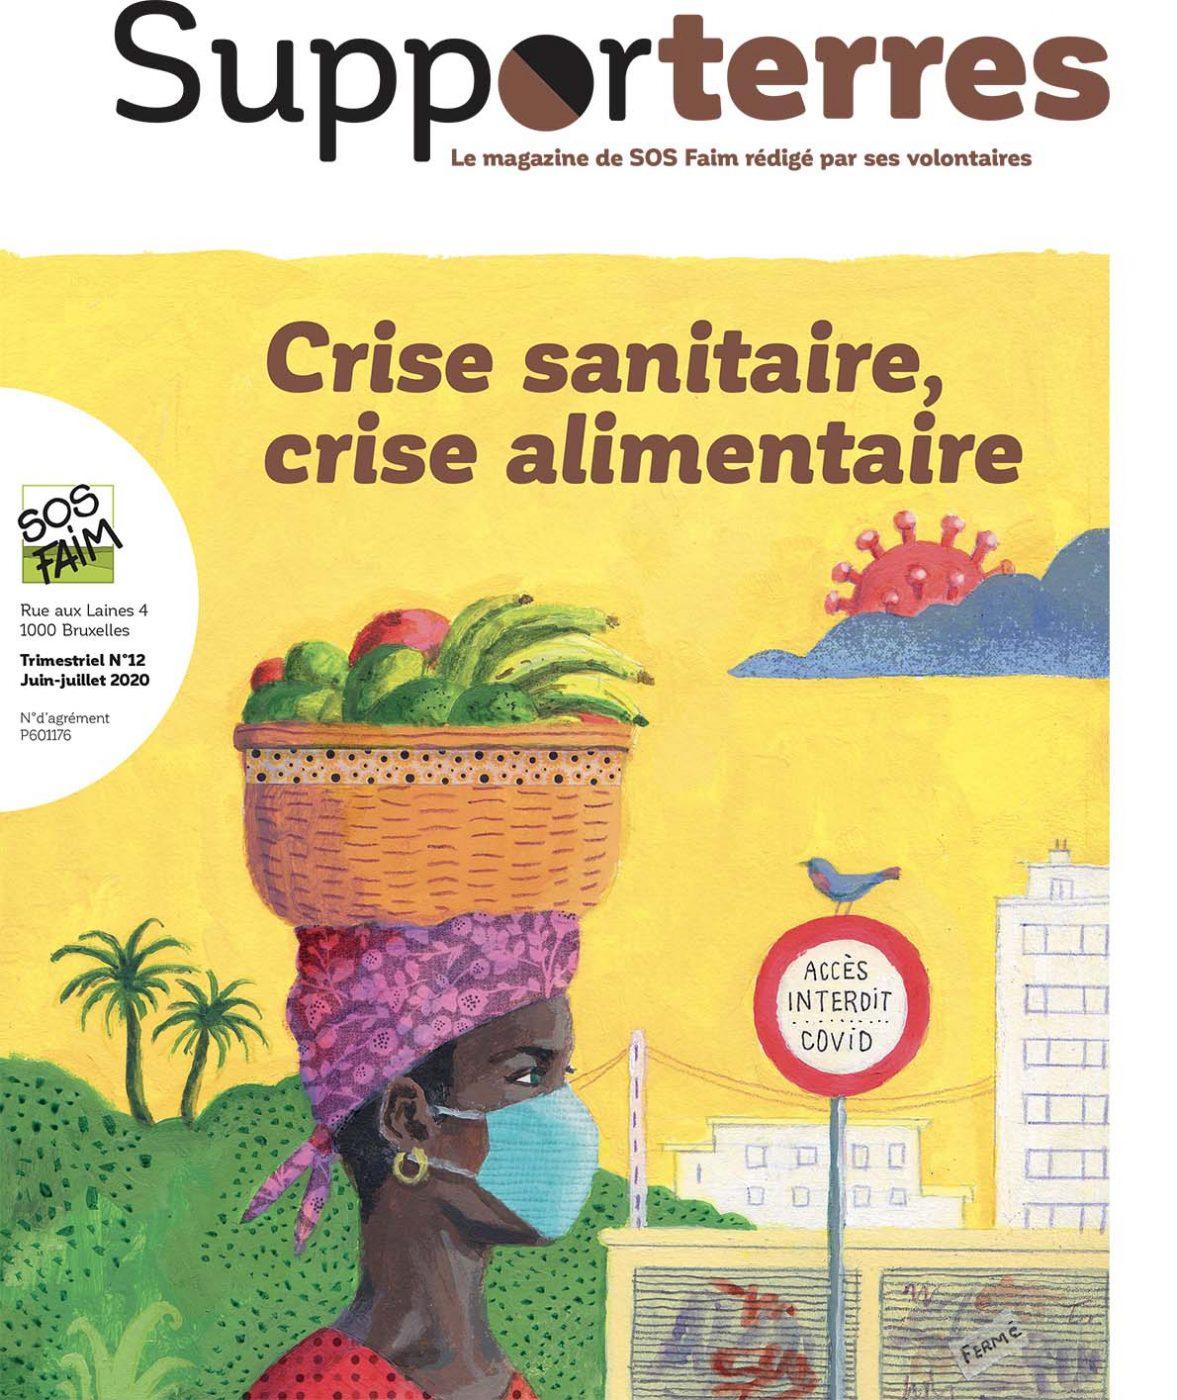 Crise sanitaire, crise alimentaire